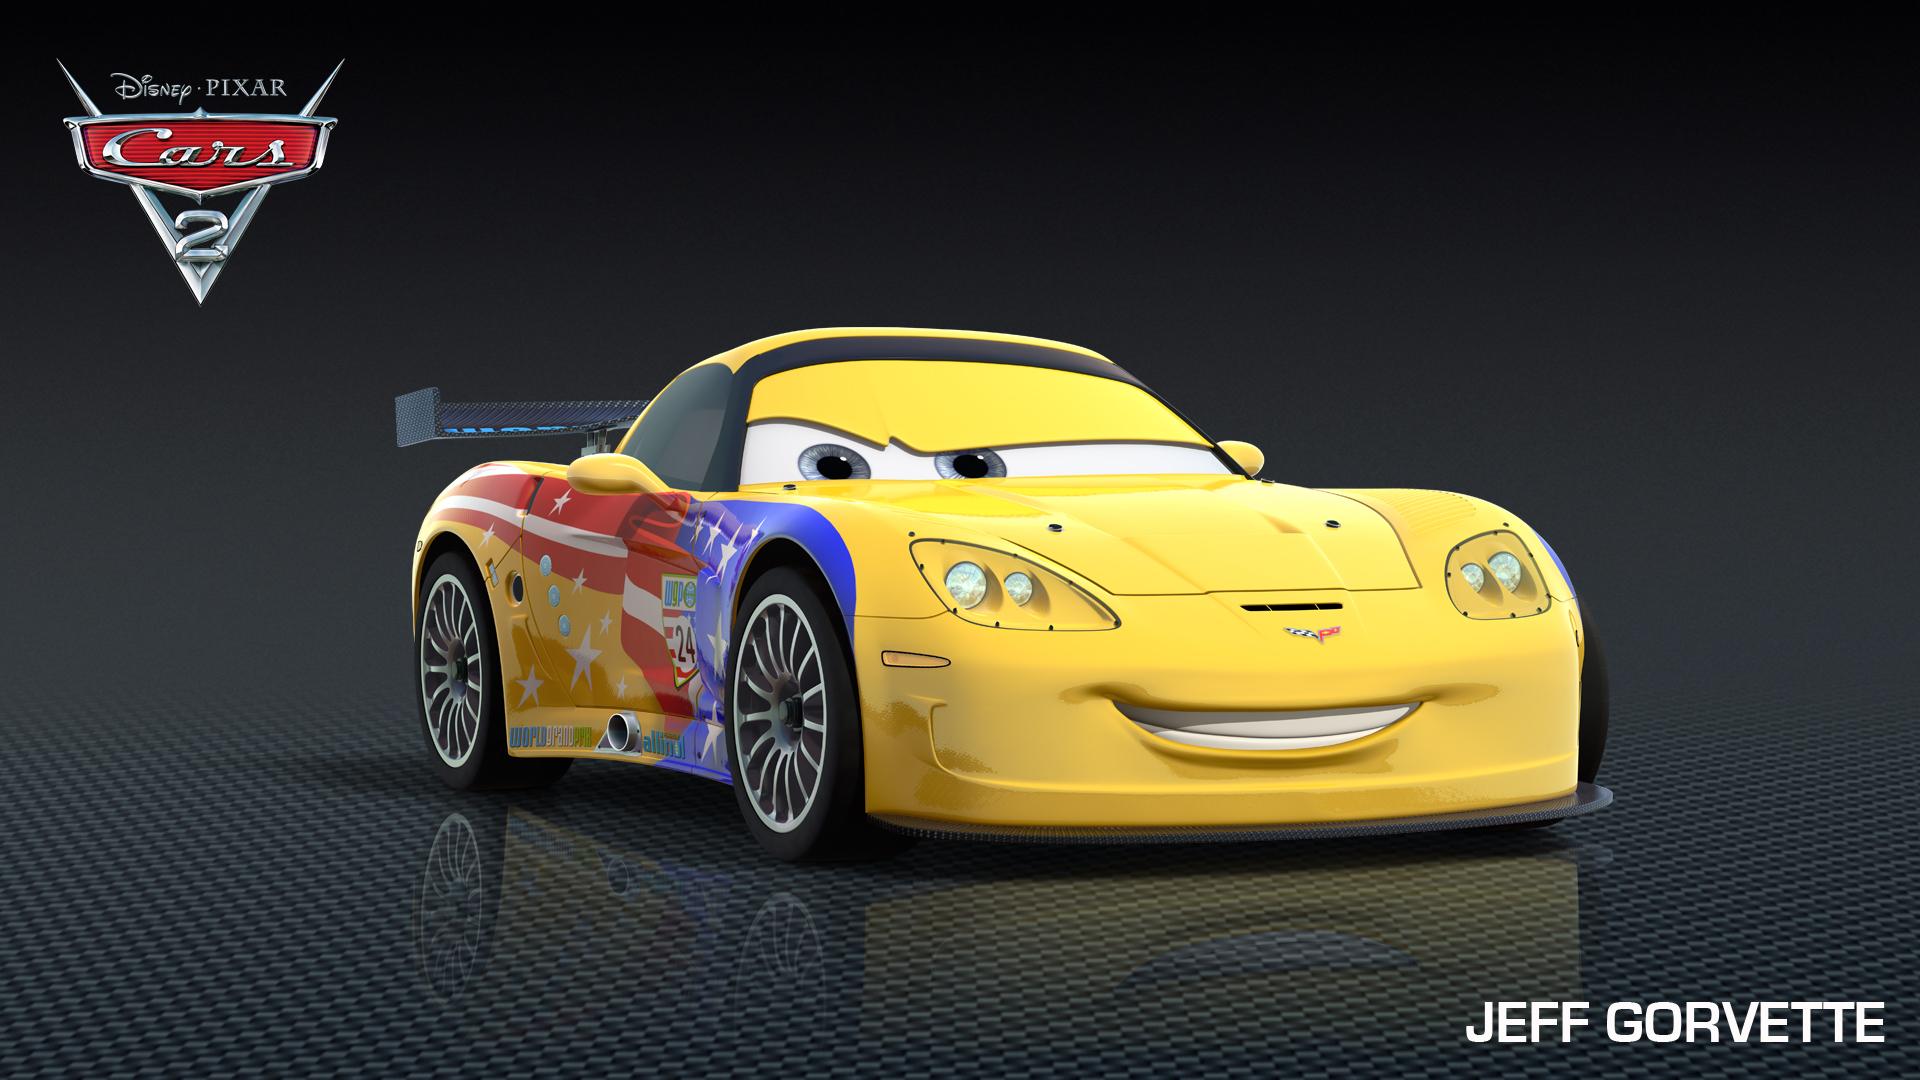 cars 2 jeff gorvette cameo corvetteforum. Black Bedroom Furniture Sets. Home Design Ideas